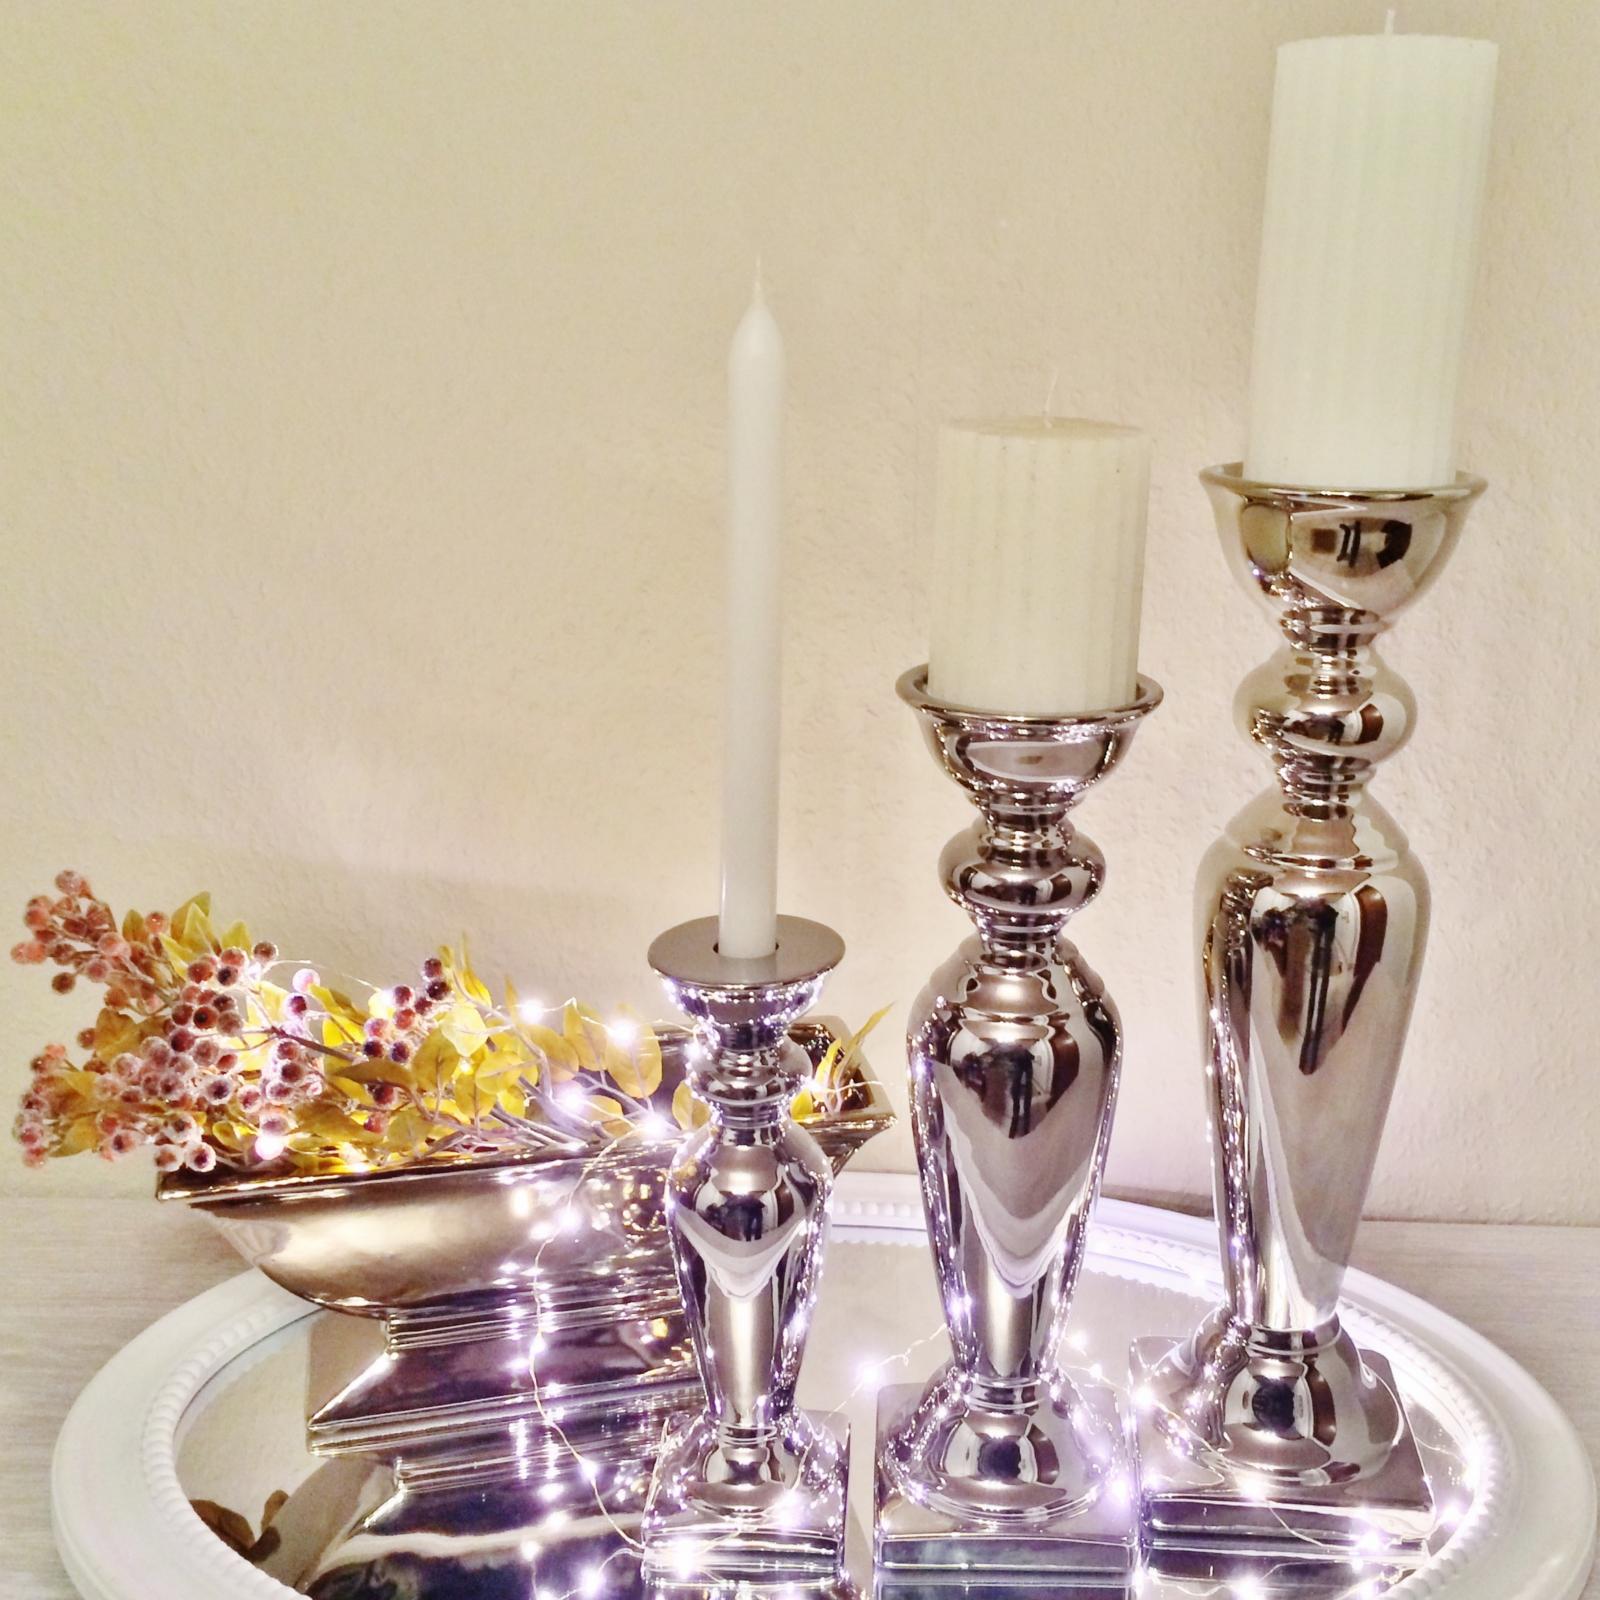 3 misure porta candele candela decorazione in ceramica for Decorazione ceramica